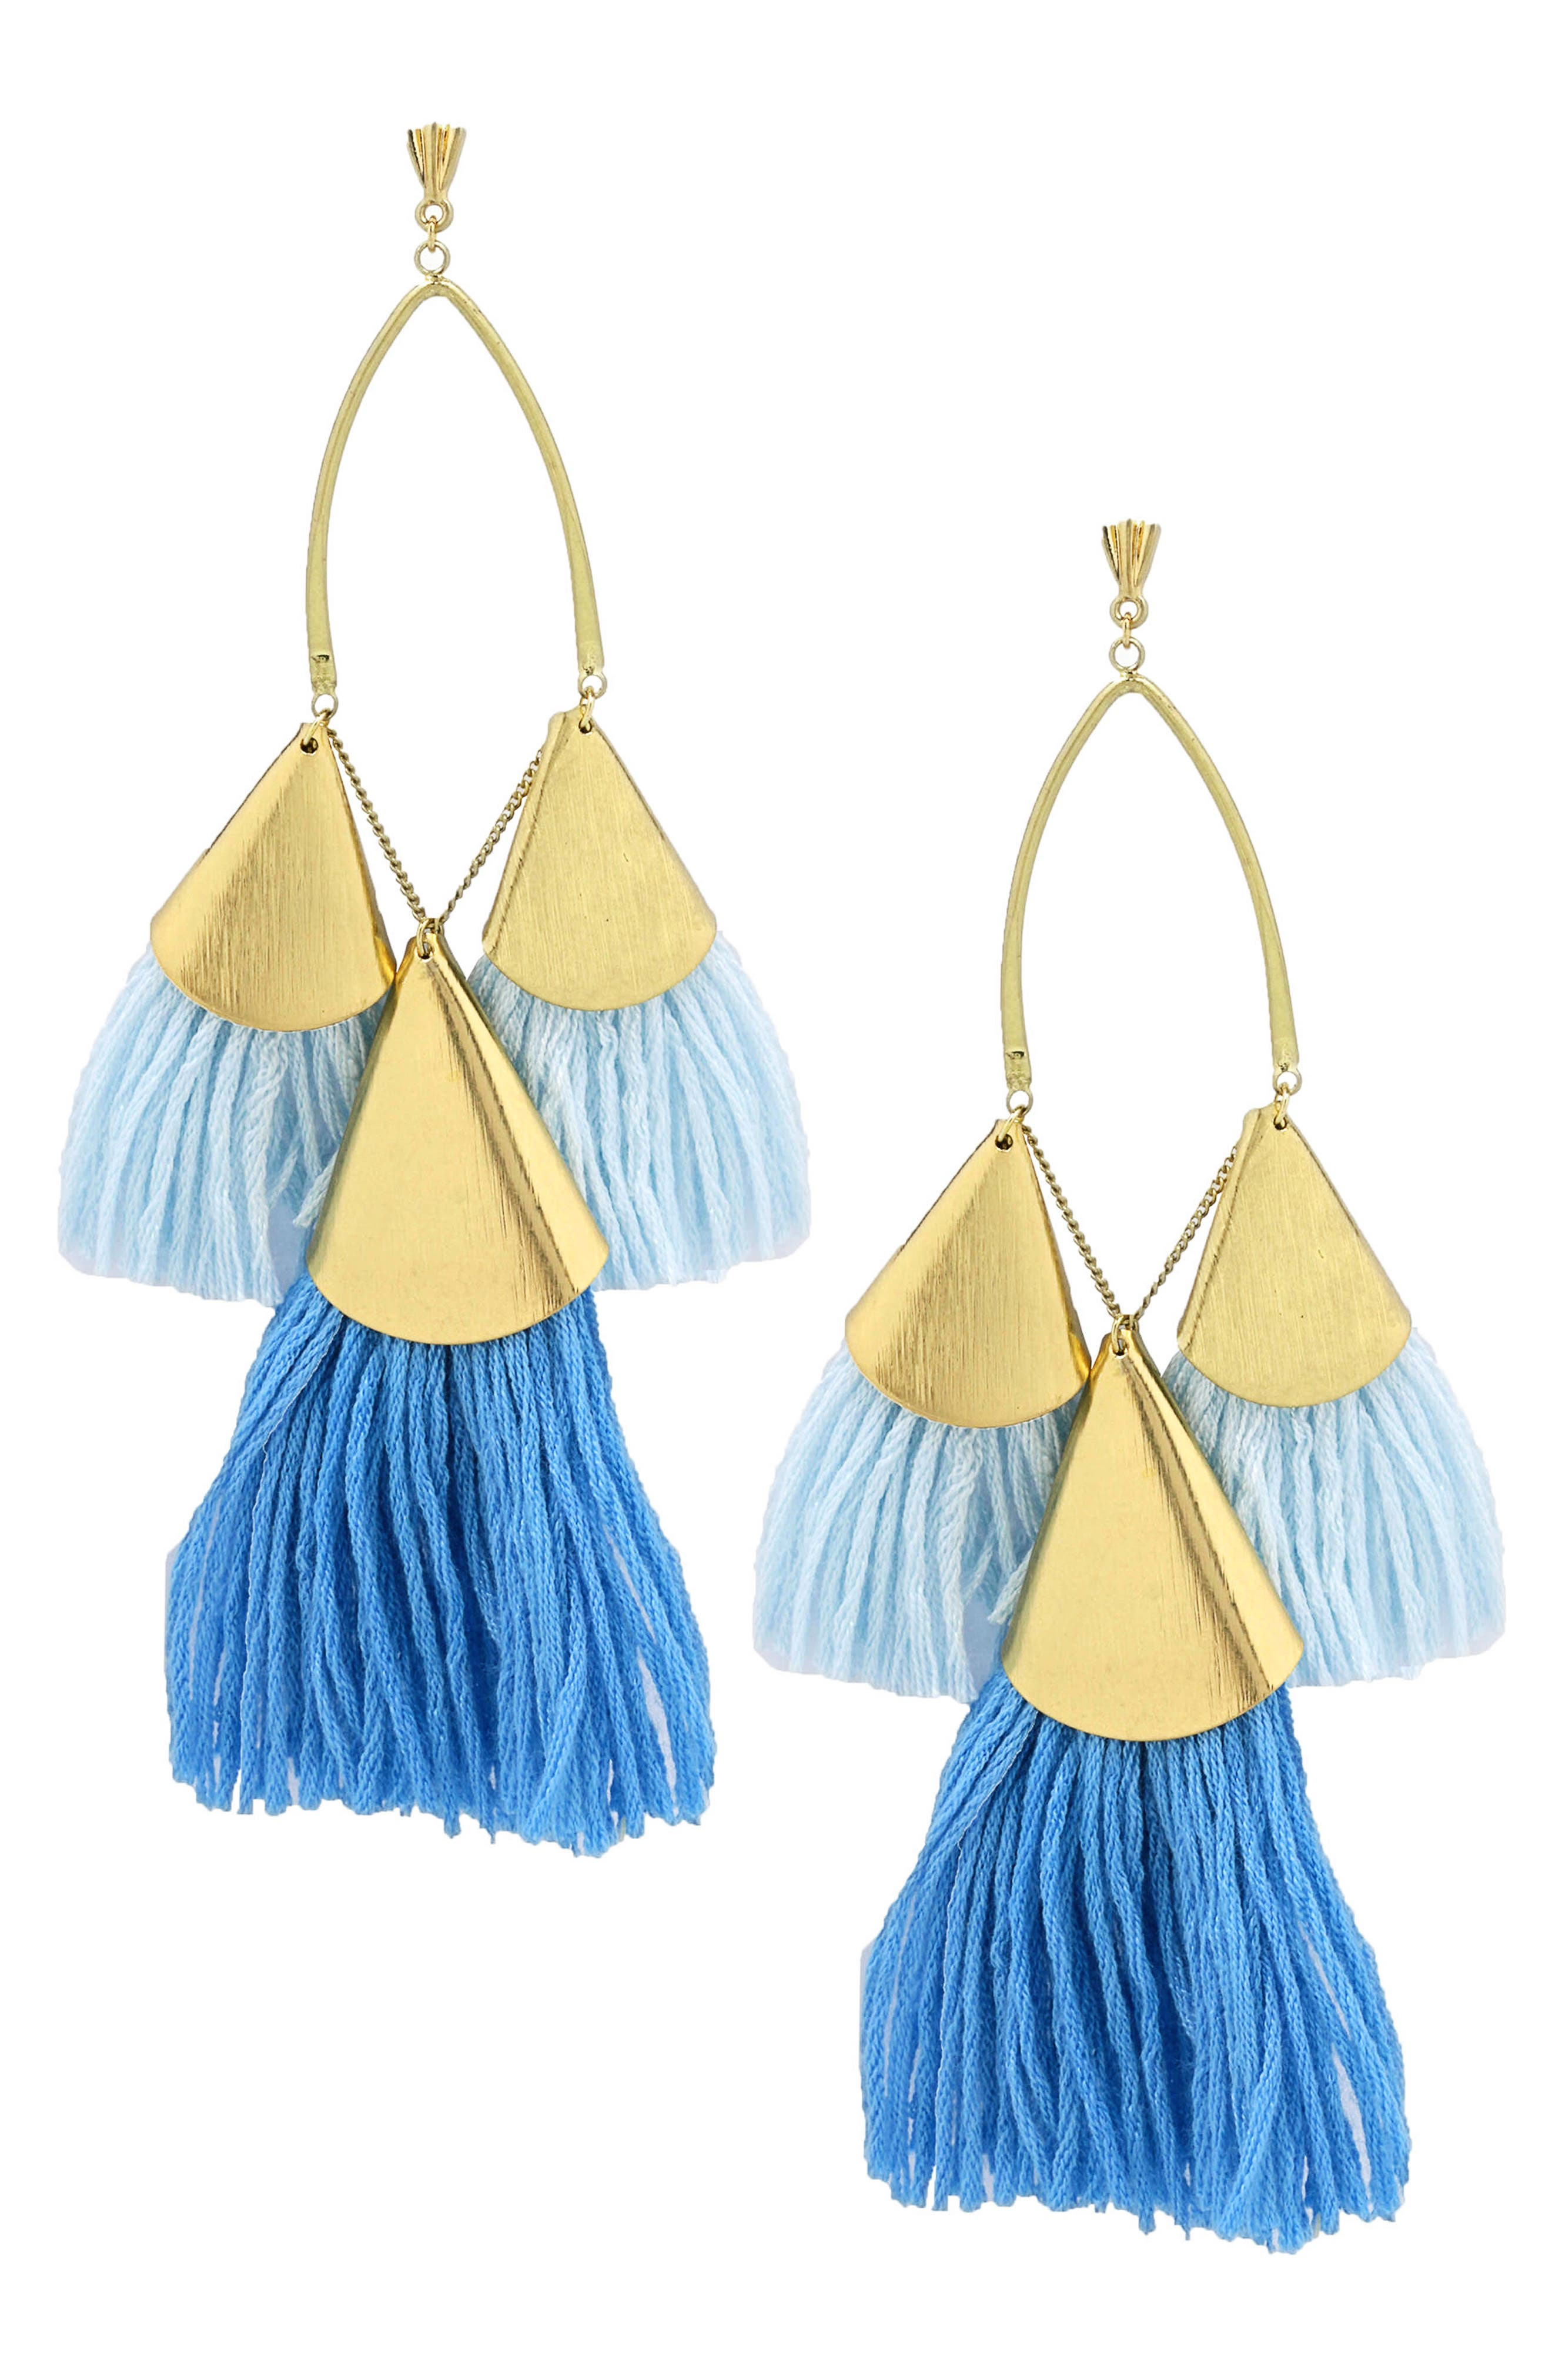 Alternate Image 1 Selected - Ettika Tassel Statement Earrings